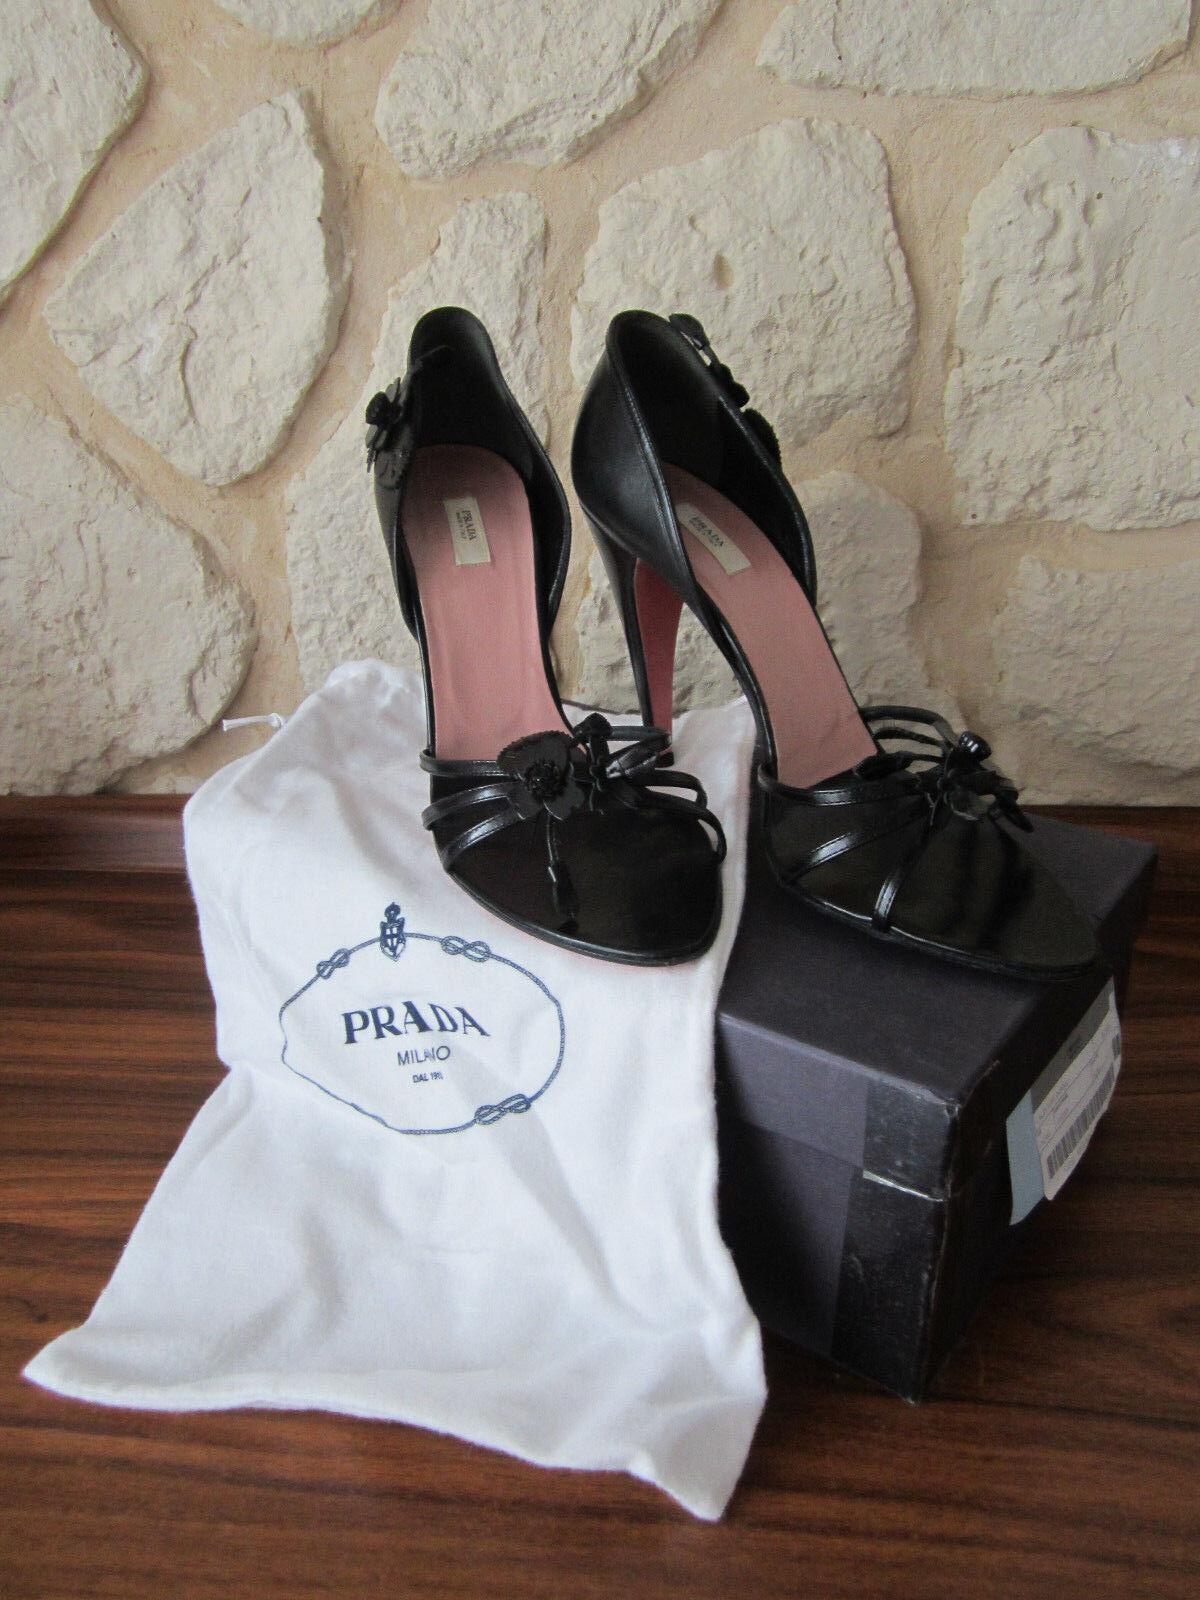 PRADA Pumps High Heels Sandale Gr. 40 (40,5) schwarz 3-218